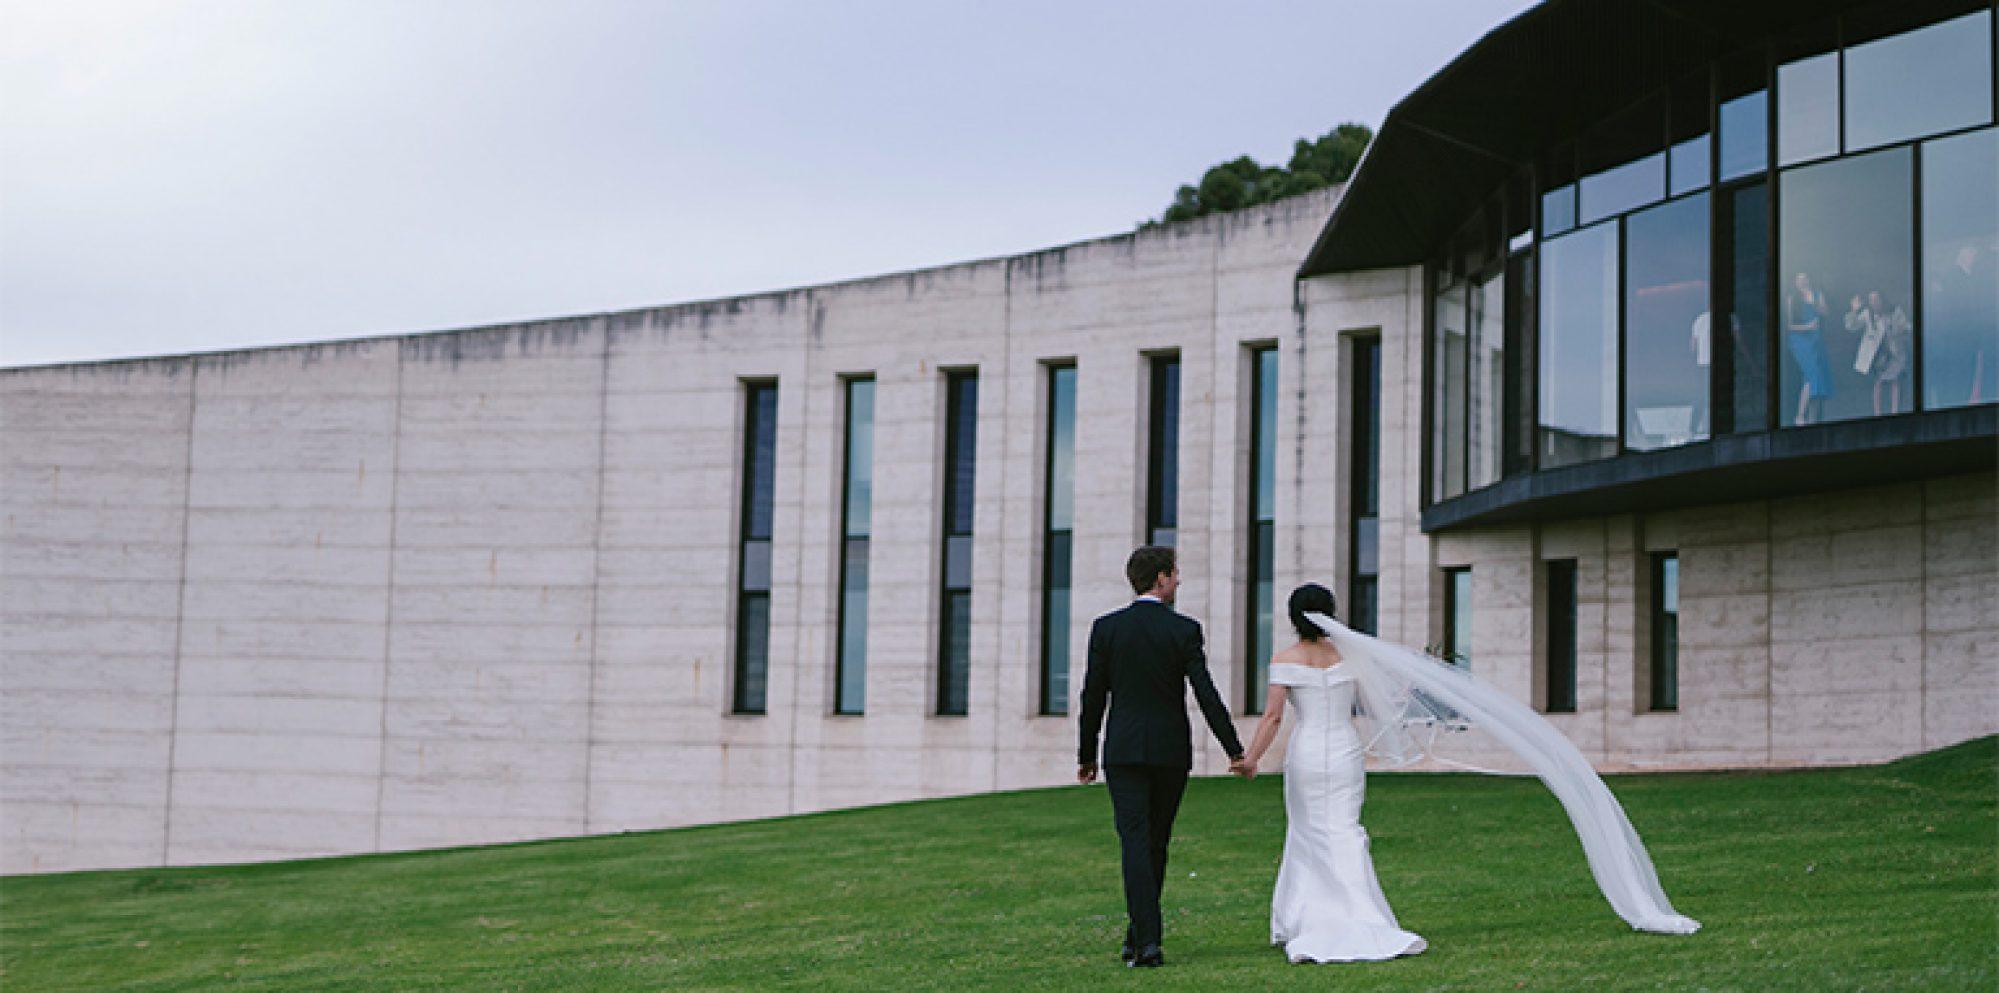 Sandy & daniel wedding photography @ port phillip estate